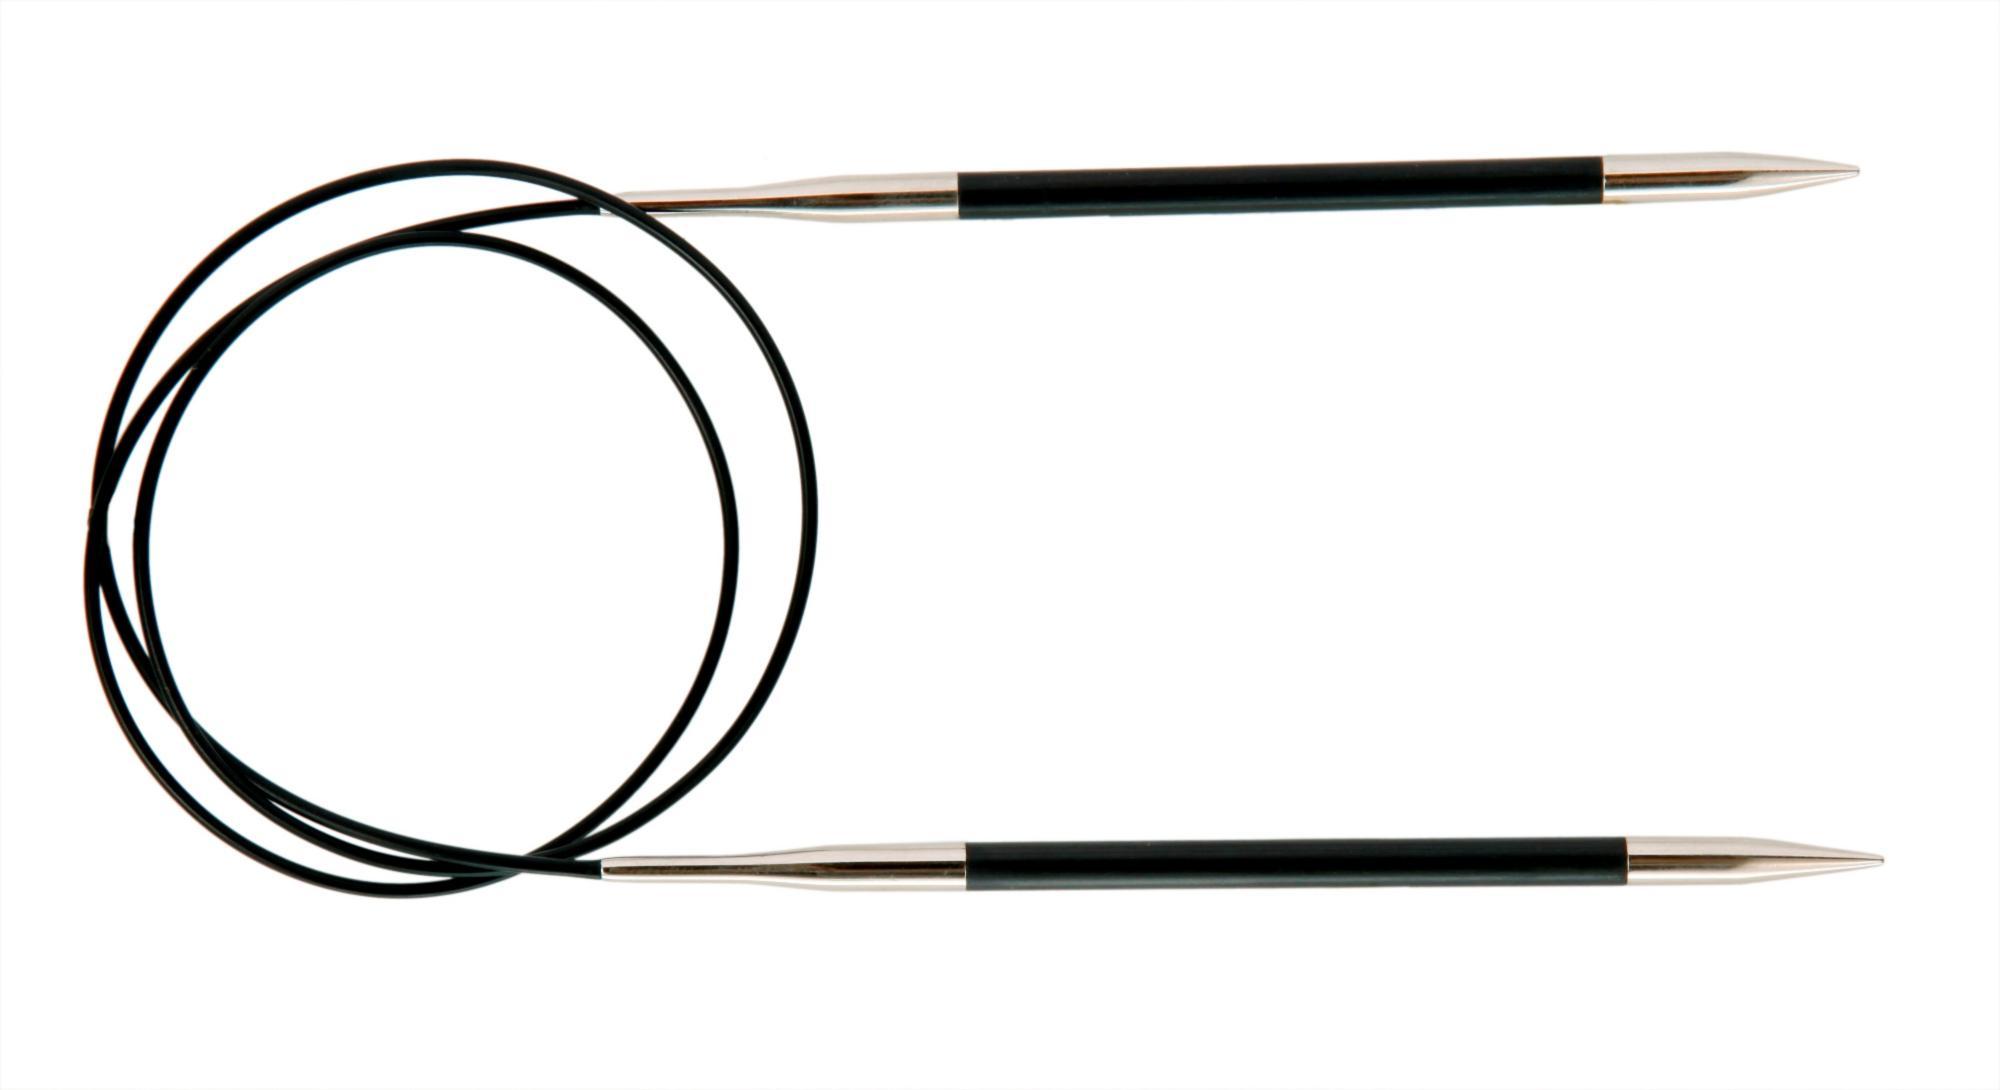 Спицы круговые 80 см Karbonz KnitPro, 41187, 3.75 мм